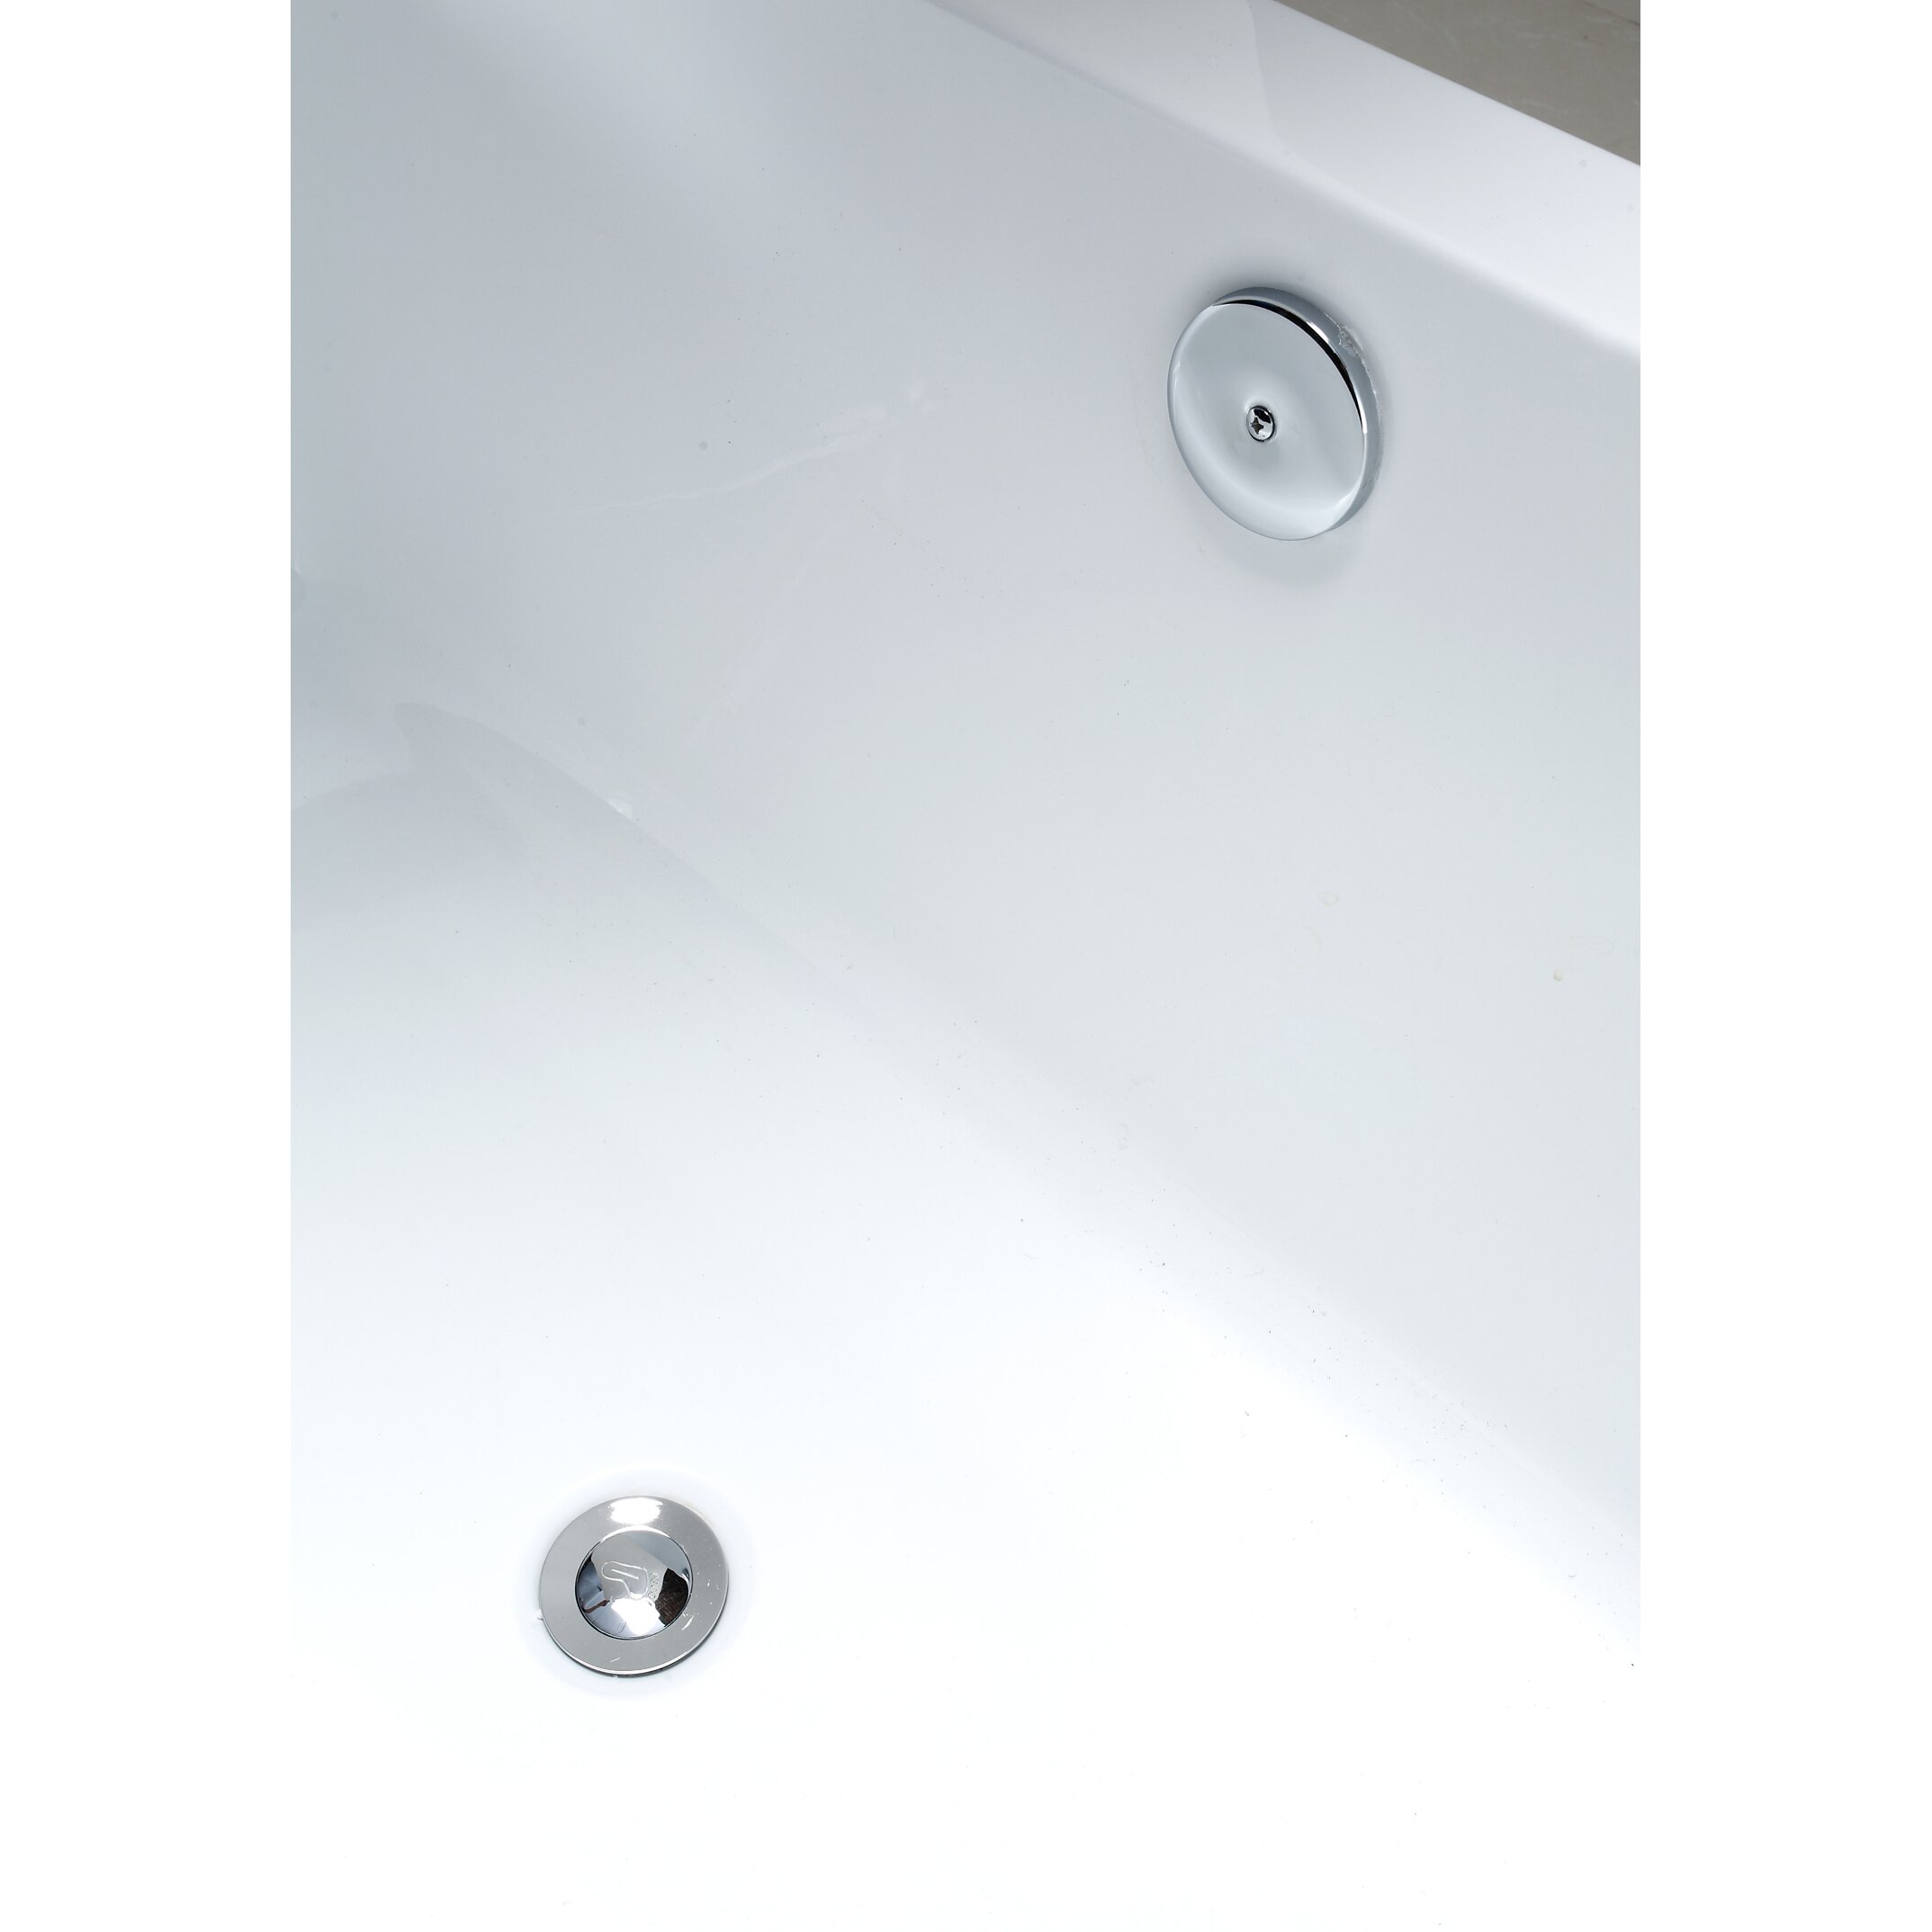 Ove Decors Shower Doors Ove Decors Kido 69 X 23 Acrylic Freestanding Bathtub Reviews